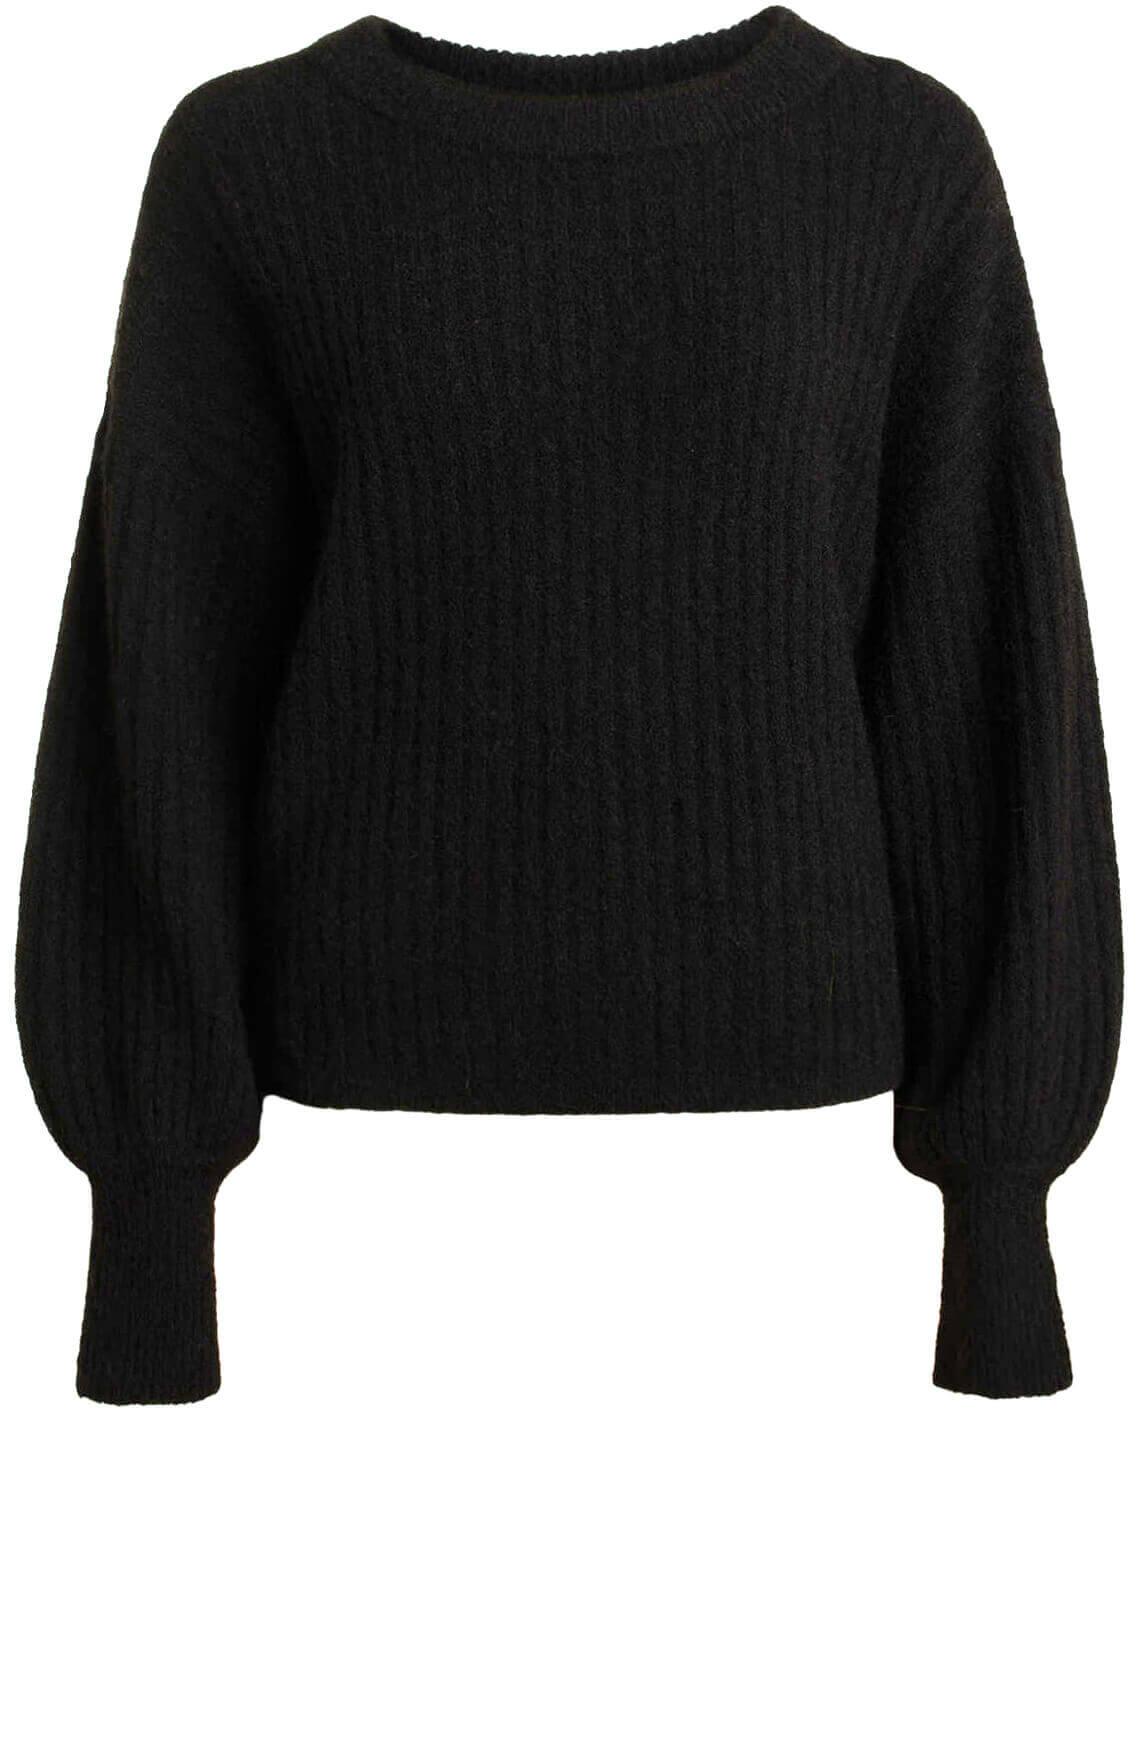 Anna Dames Gebreide trui zwart